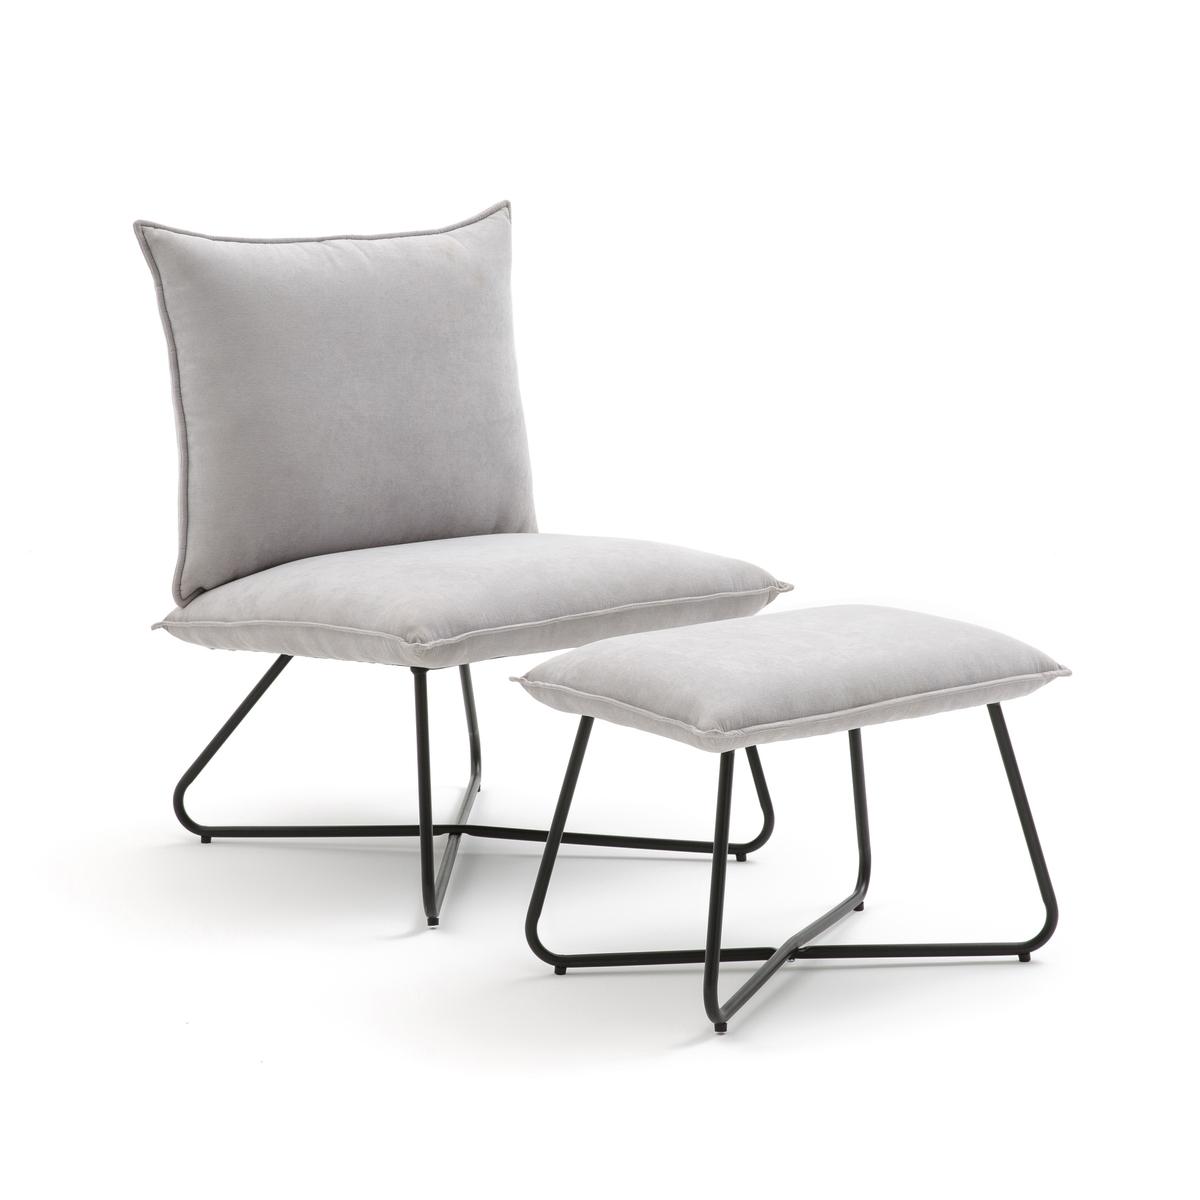 Кресло LaRedoute С подножкой RUBY 1-мест. серый